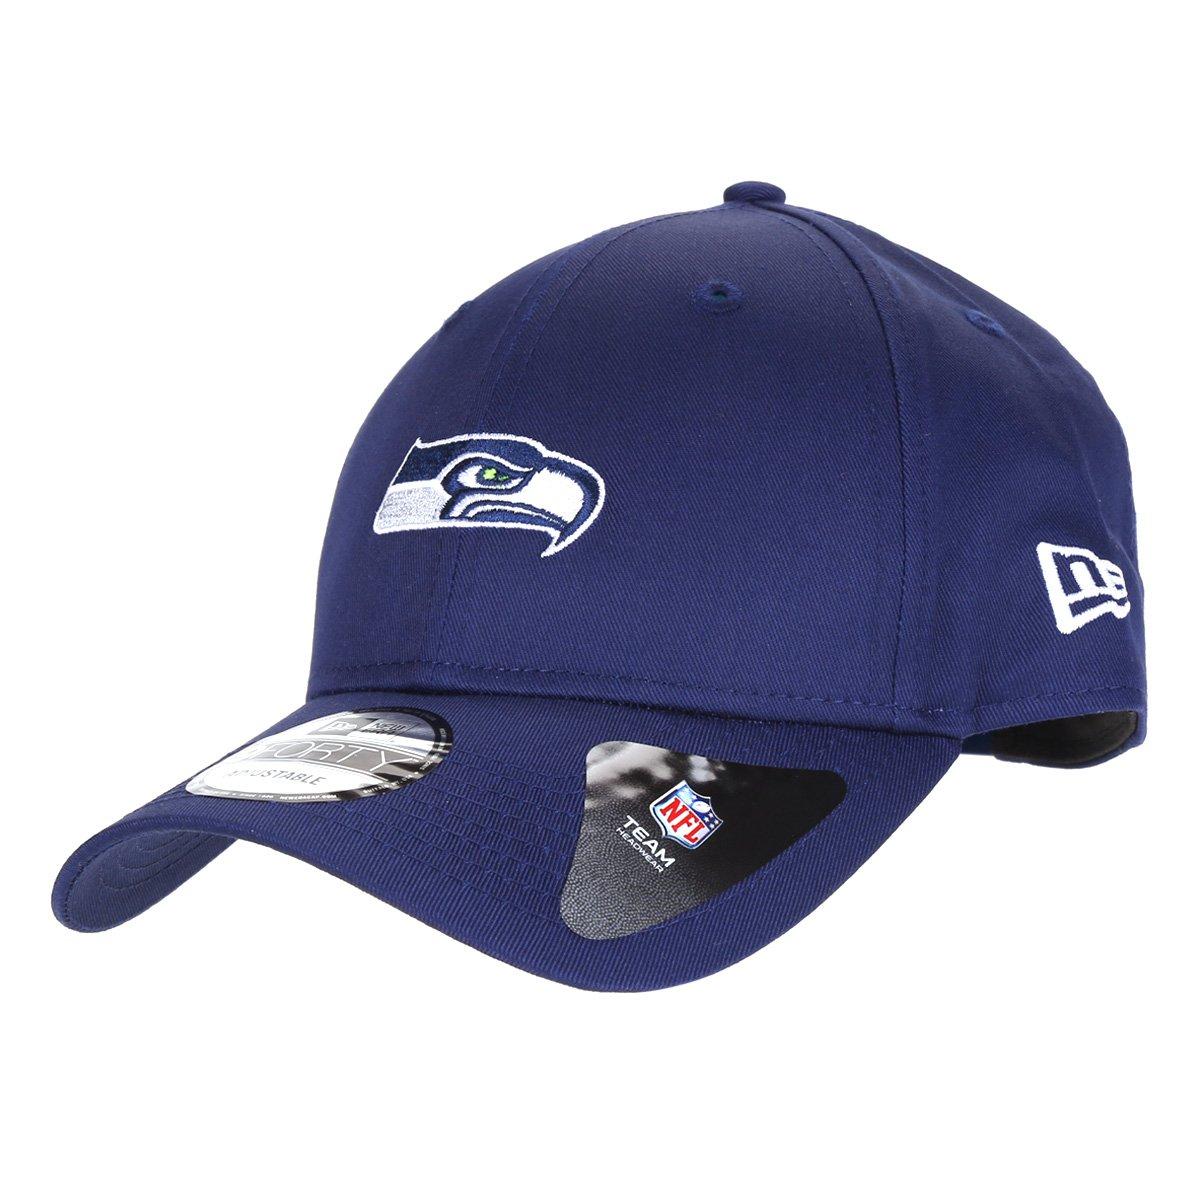 Boné NFL Seattle Seahawks New Era Aba Curva Snapback 940